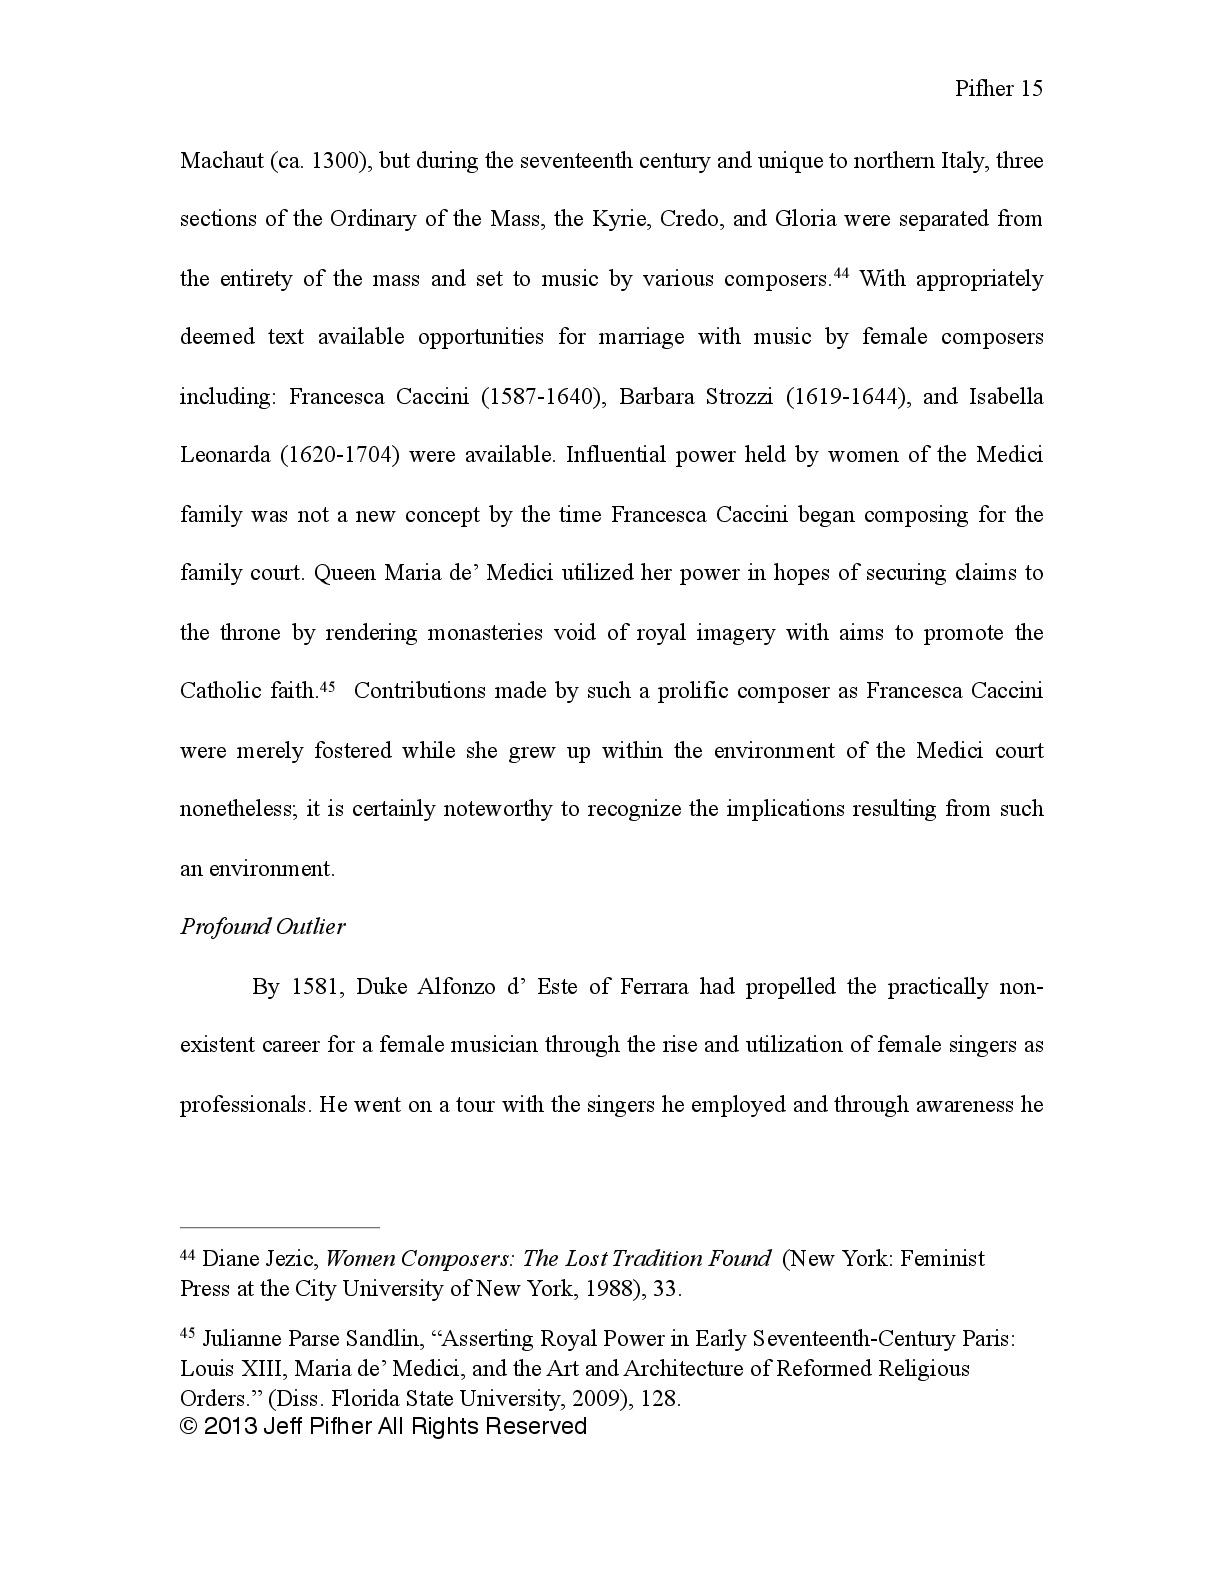 Jeff-Pifher-Music-and-Mediciean-Influences-(Academic-Series)-015.jpg